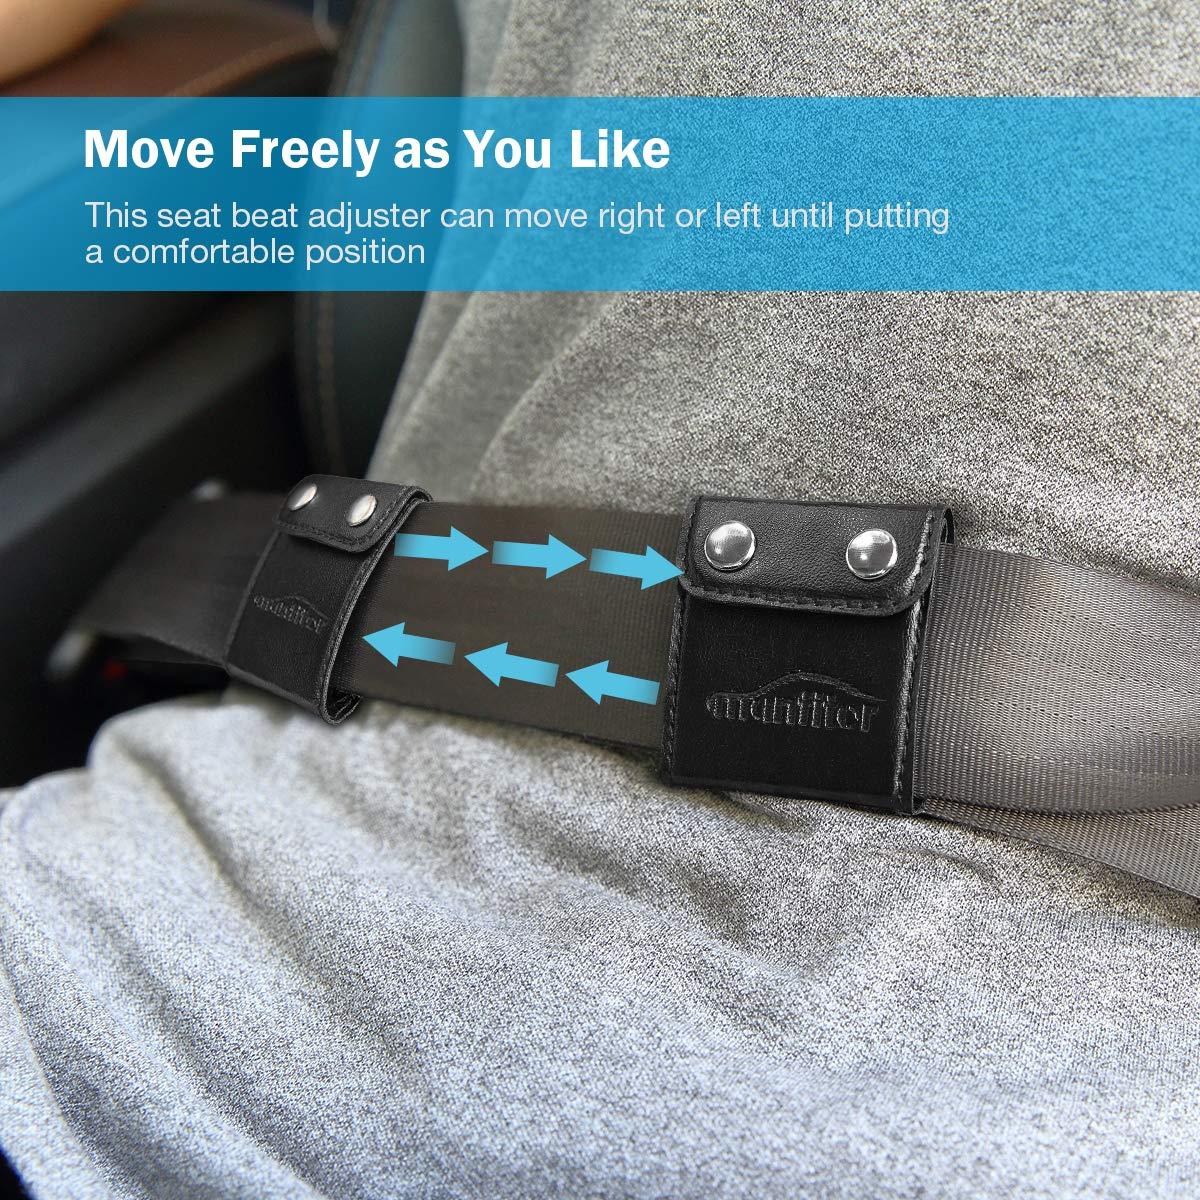 2 pack, black Comfortable Universal Vehicle Auto Seat Belt Shoulder Neck Strap Positioner Locking Clips with PU Leather for Toddler Baby Kids Adults Manfiter Seatbelt Adjuster